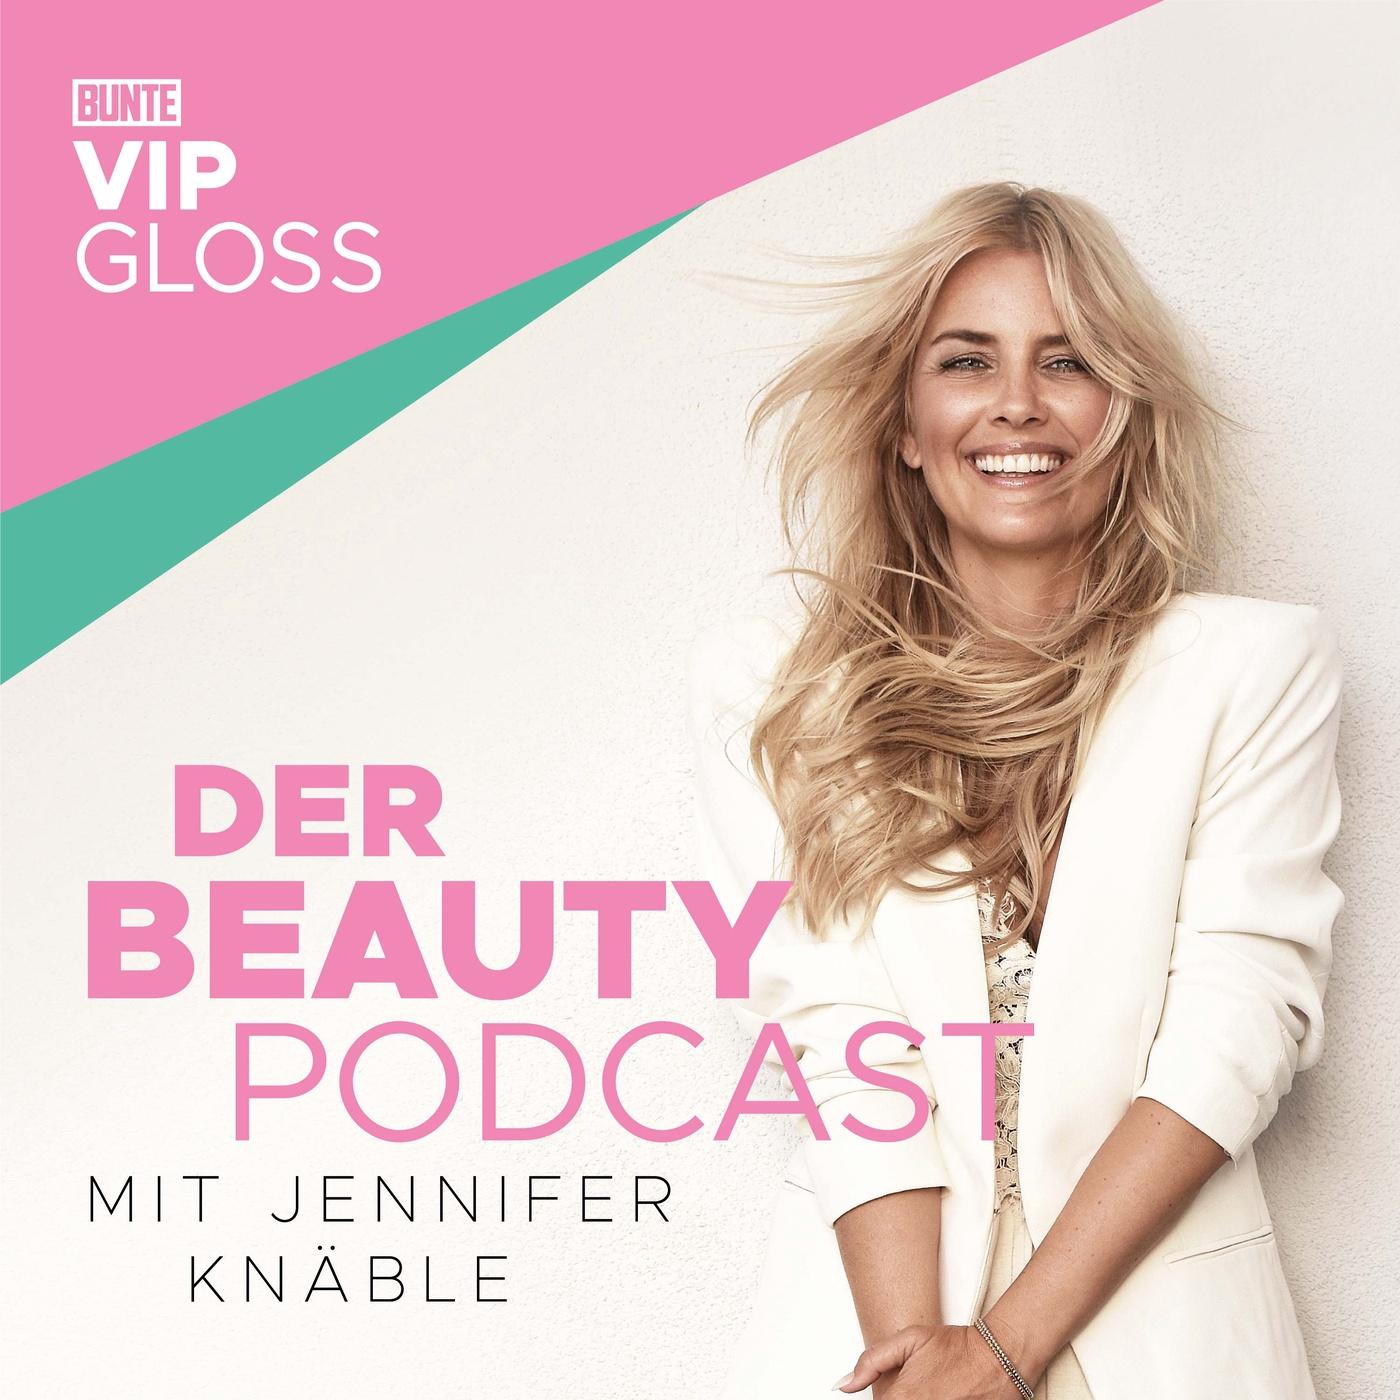 BUNTE VIP GLOSS - Der Beauty Podcast